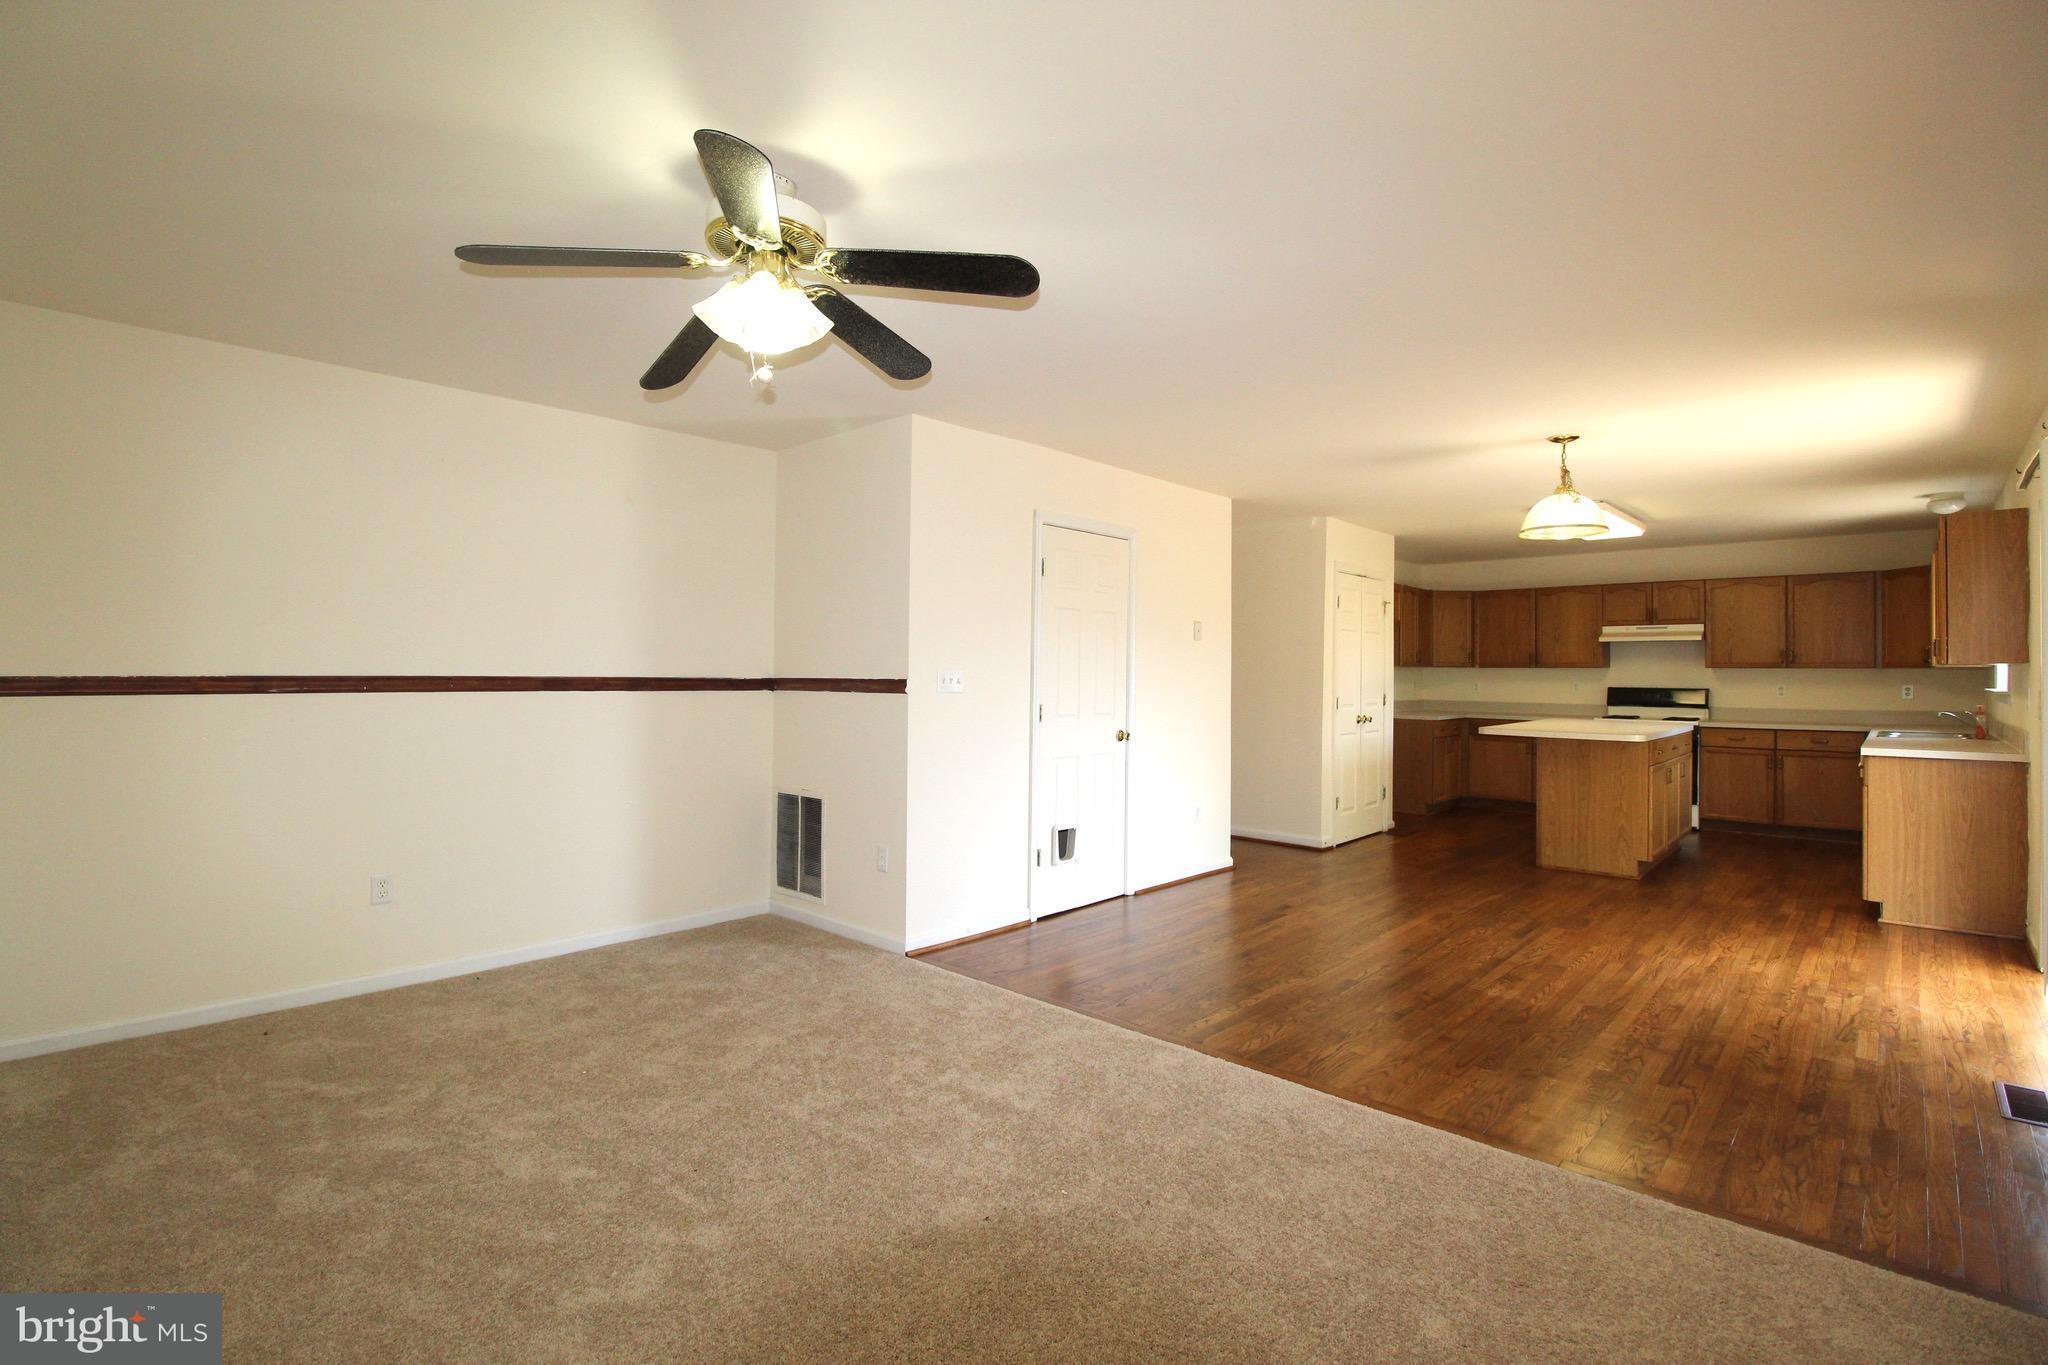 123 CHARLOTTE CT, Martinsburg, WV 25401 $195,000 www.mattridgeway ...